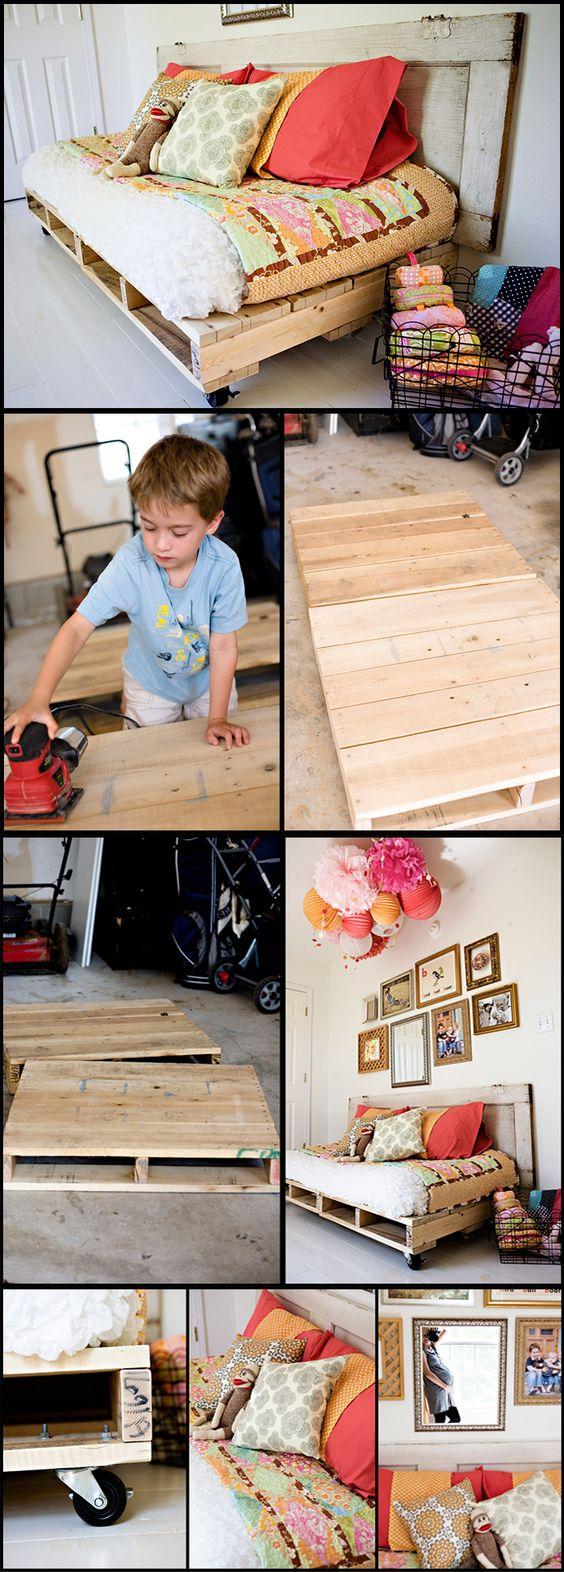 pale-sofa-cama-movil-muy-ingenioso-pallet-DIY